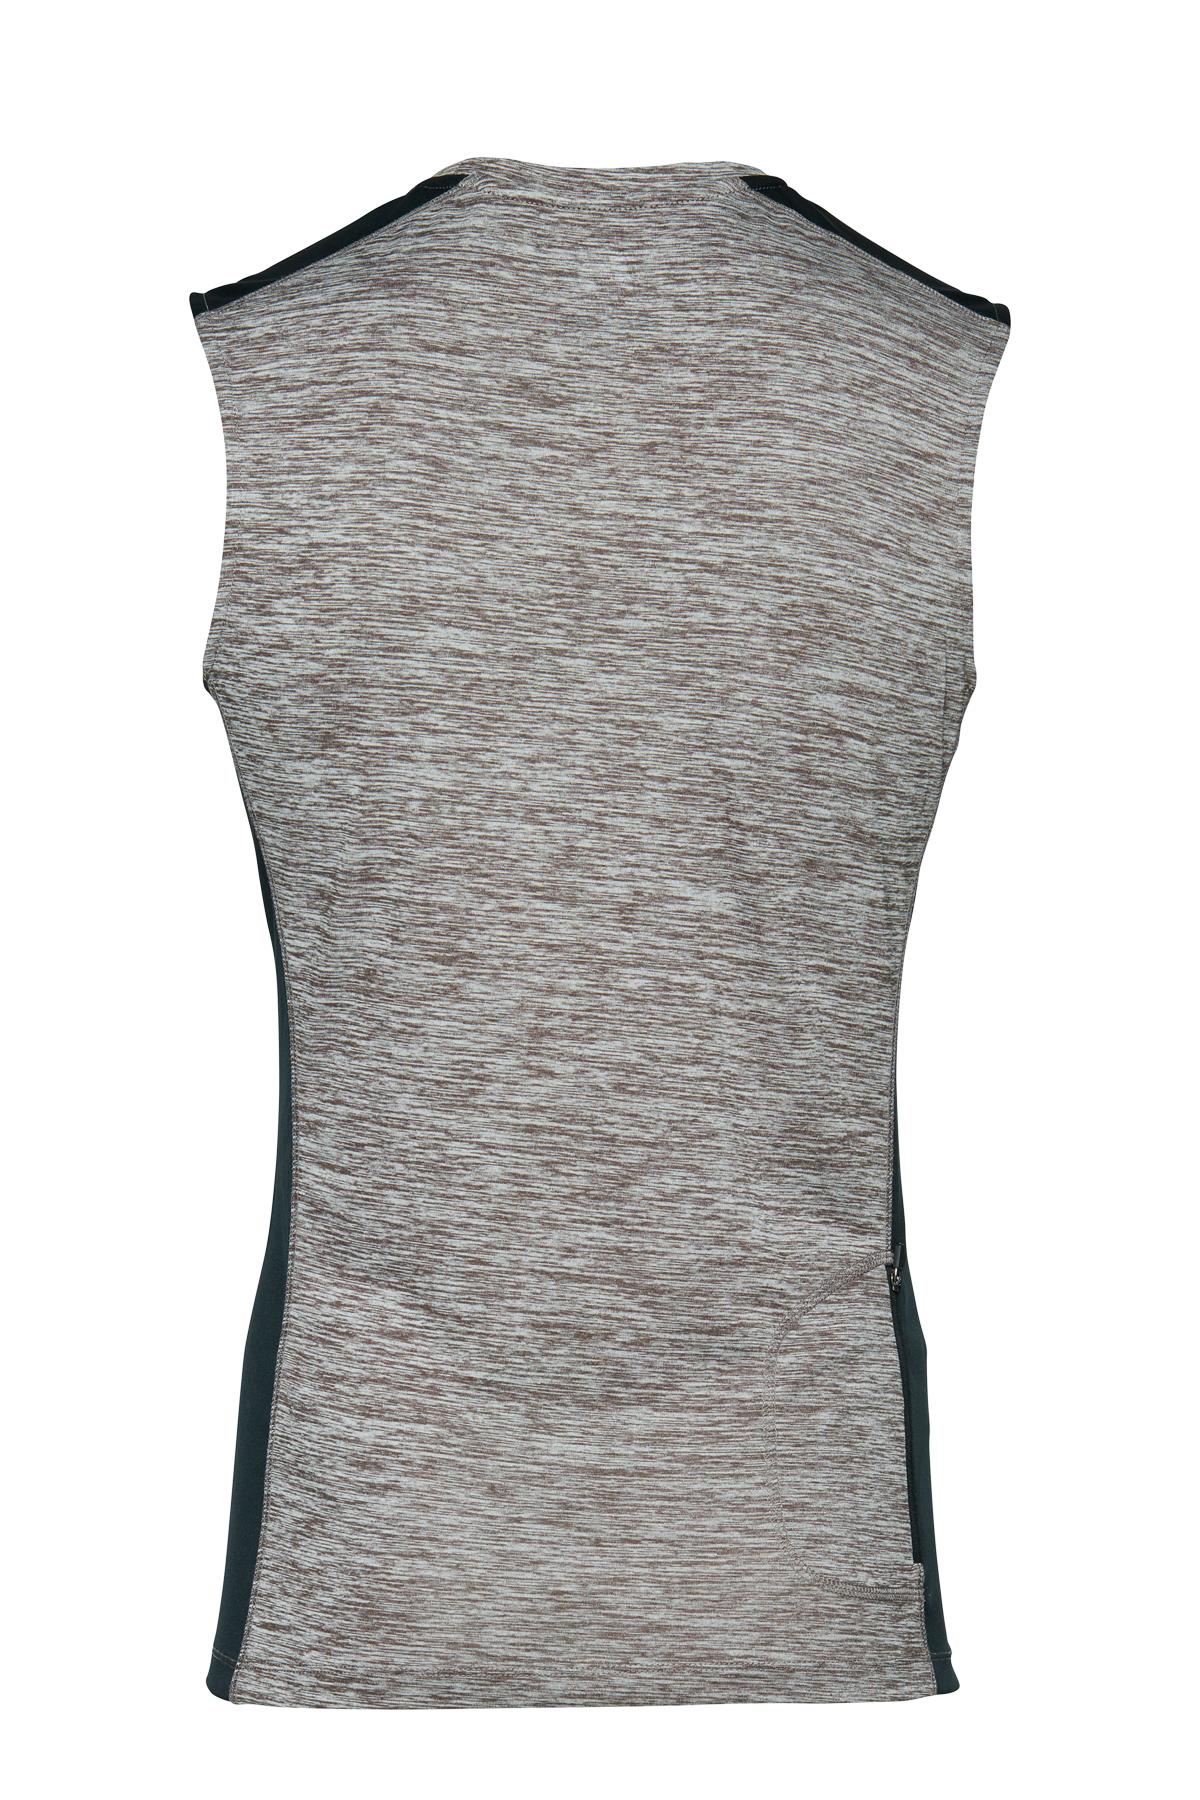 Stone mix T-shirt fra Blend Athletics – Køb Stone mix T-shirt fra str. M-XXL her